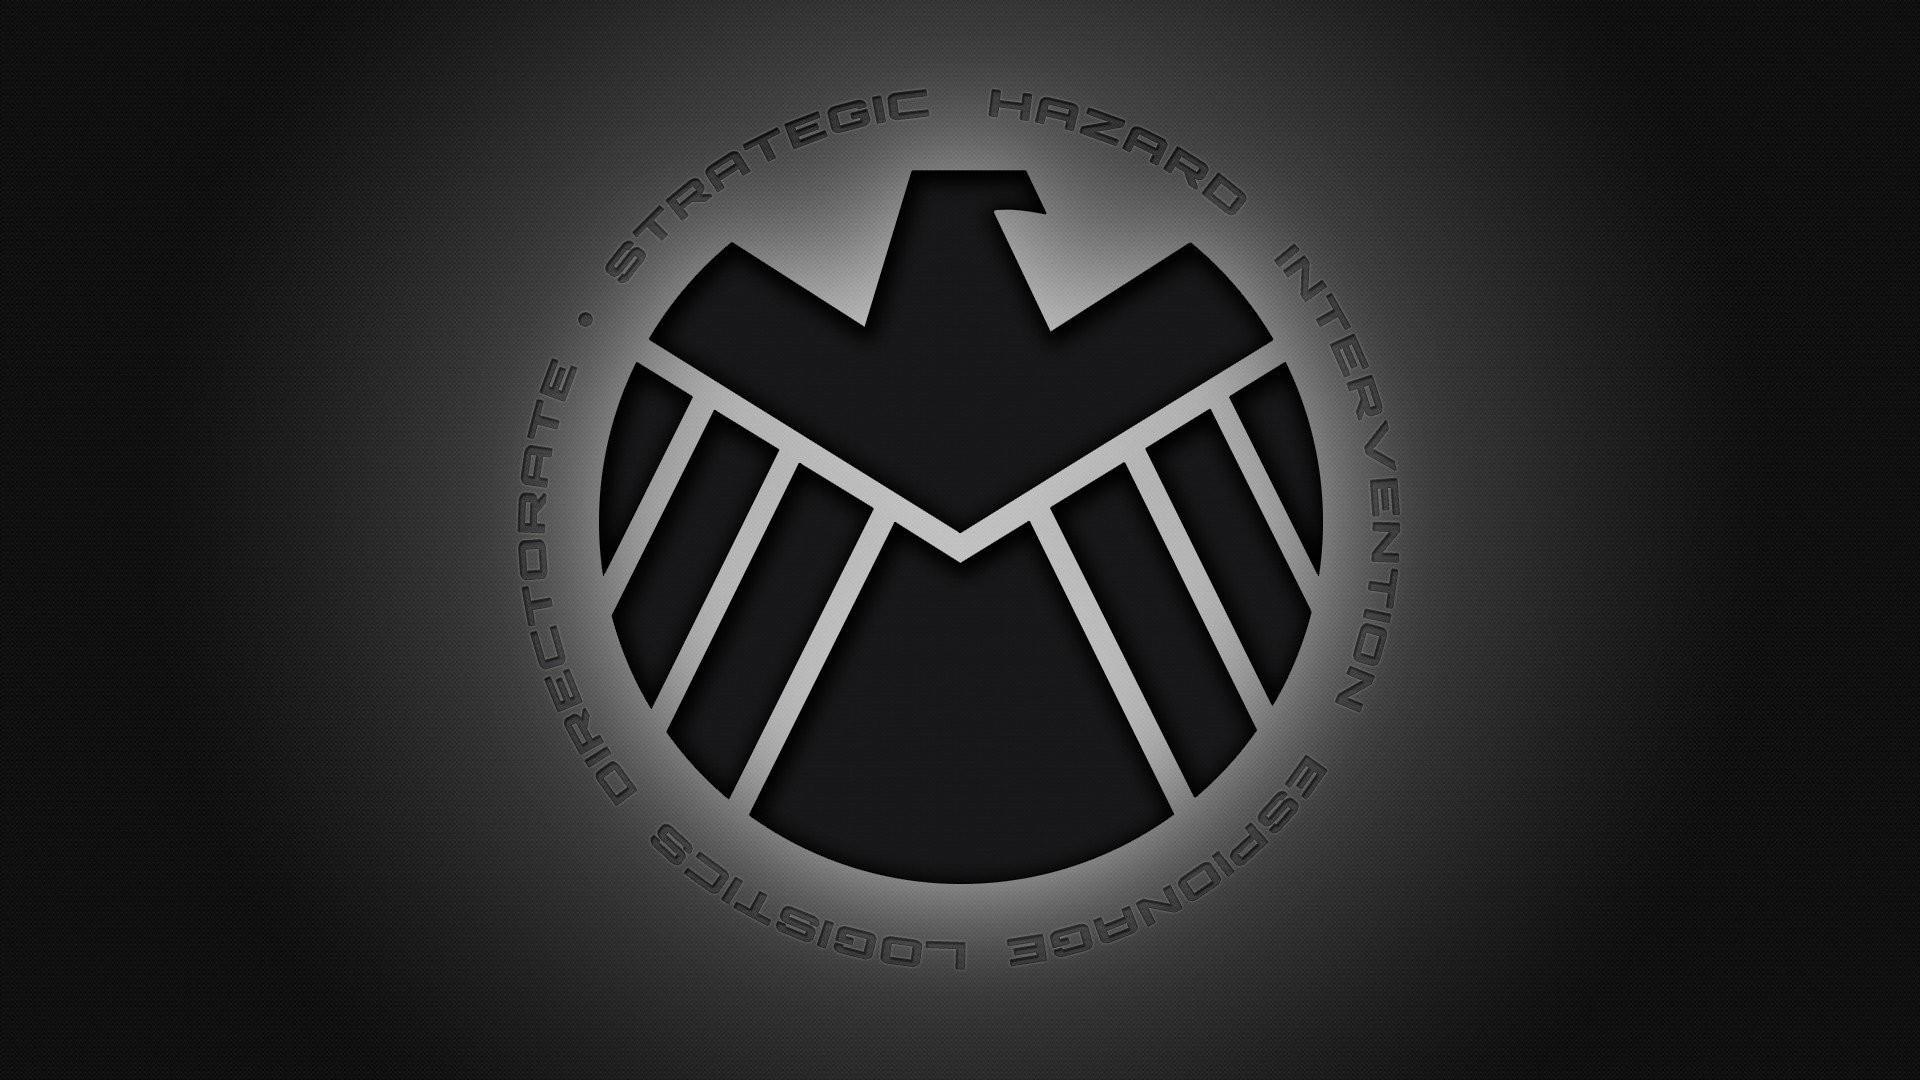 … agents of shield wallpaper …